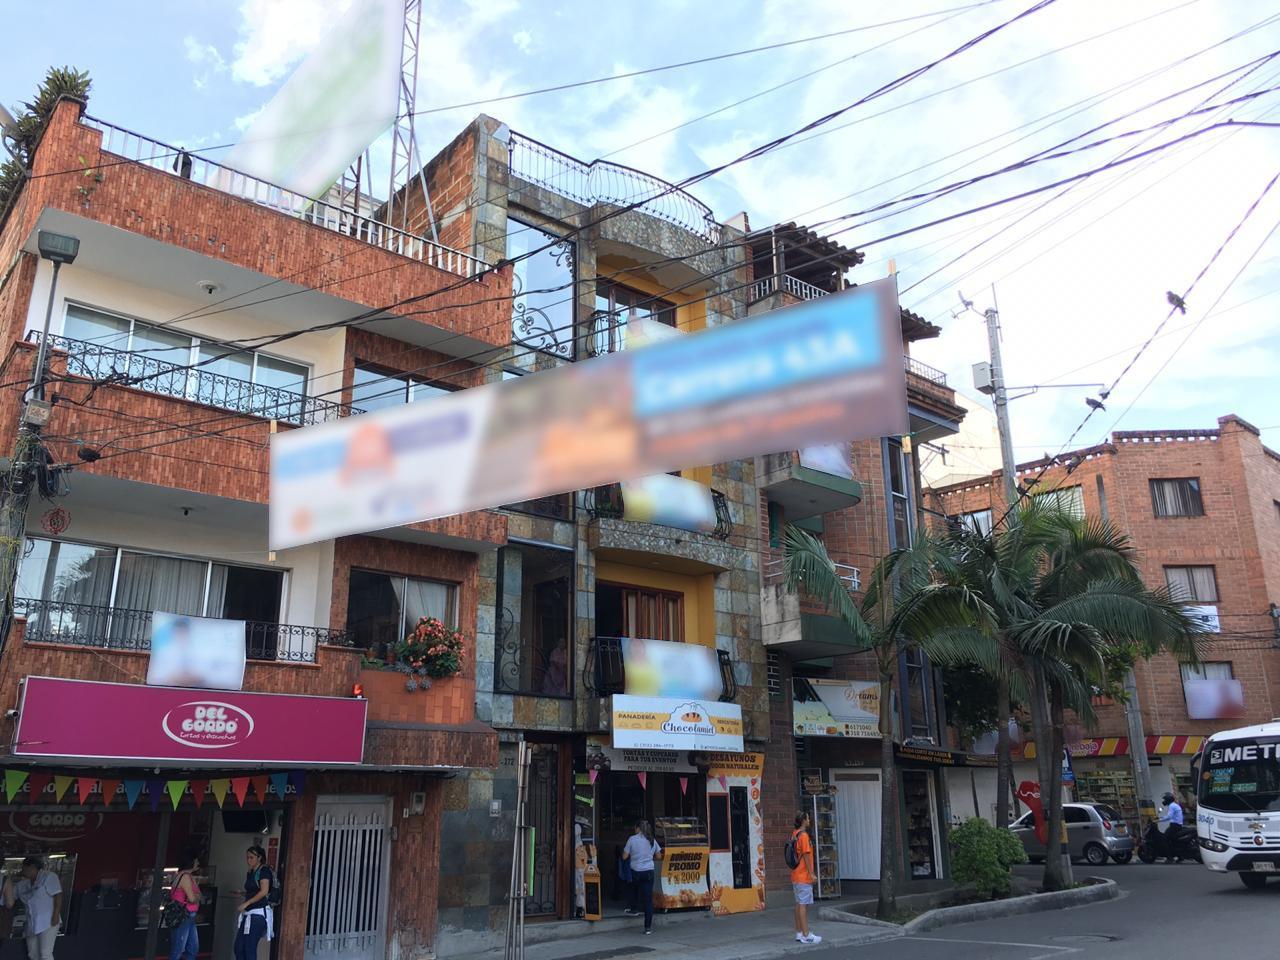 Habitantes de Sabaneta inconformes por abundancia de vallas publicitarias